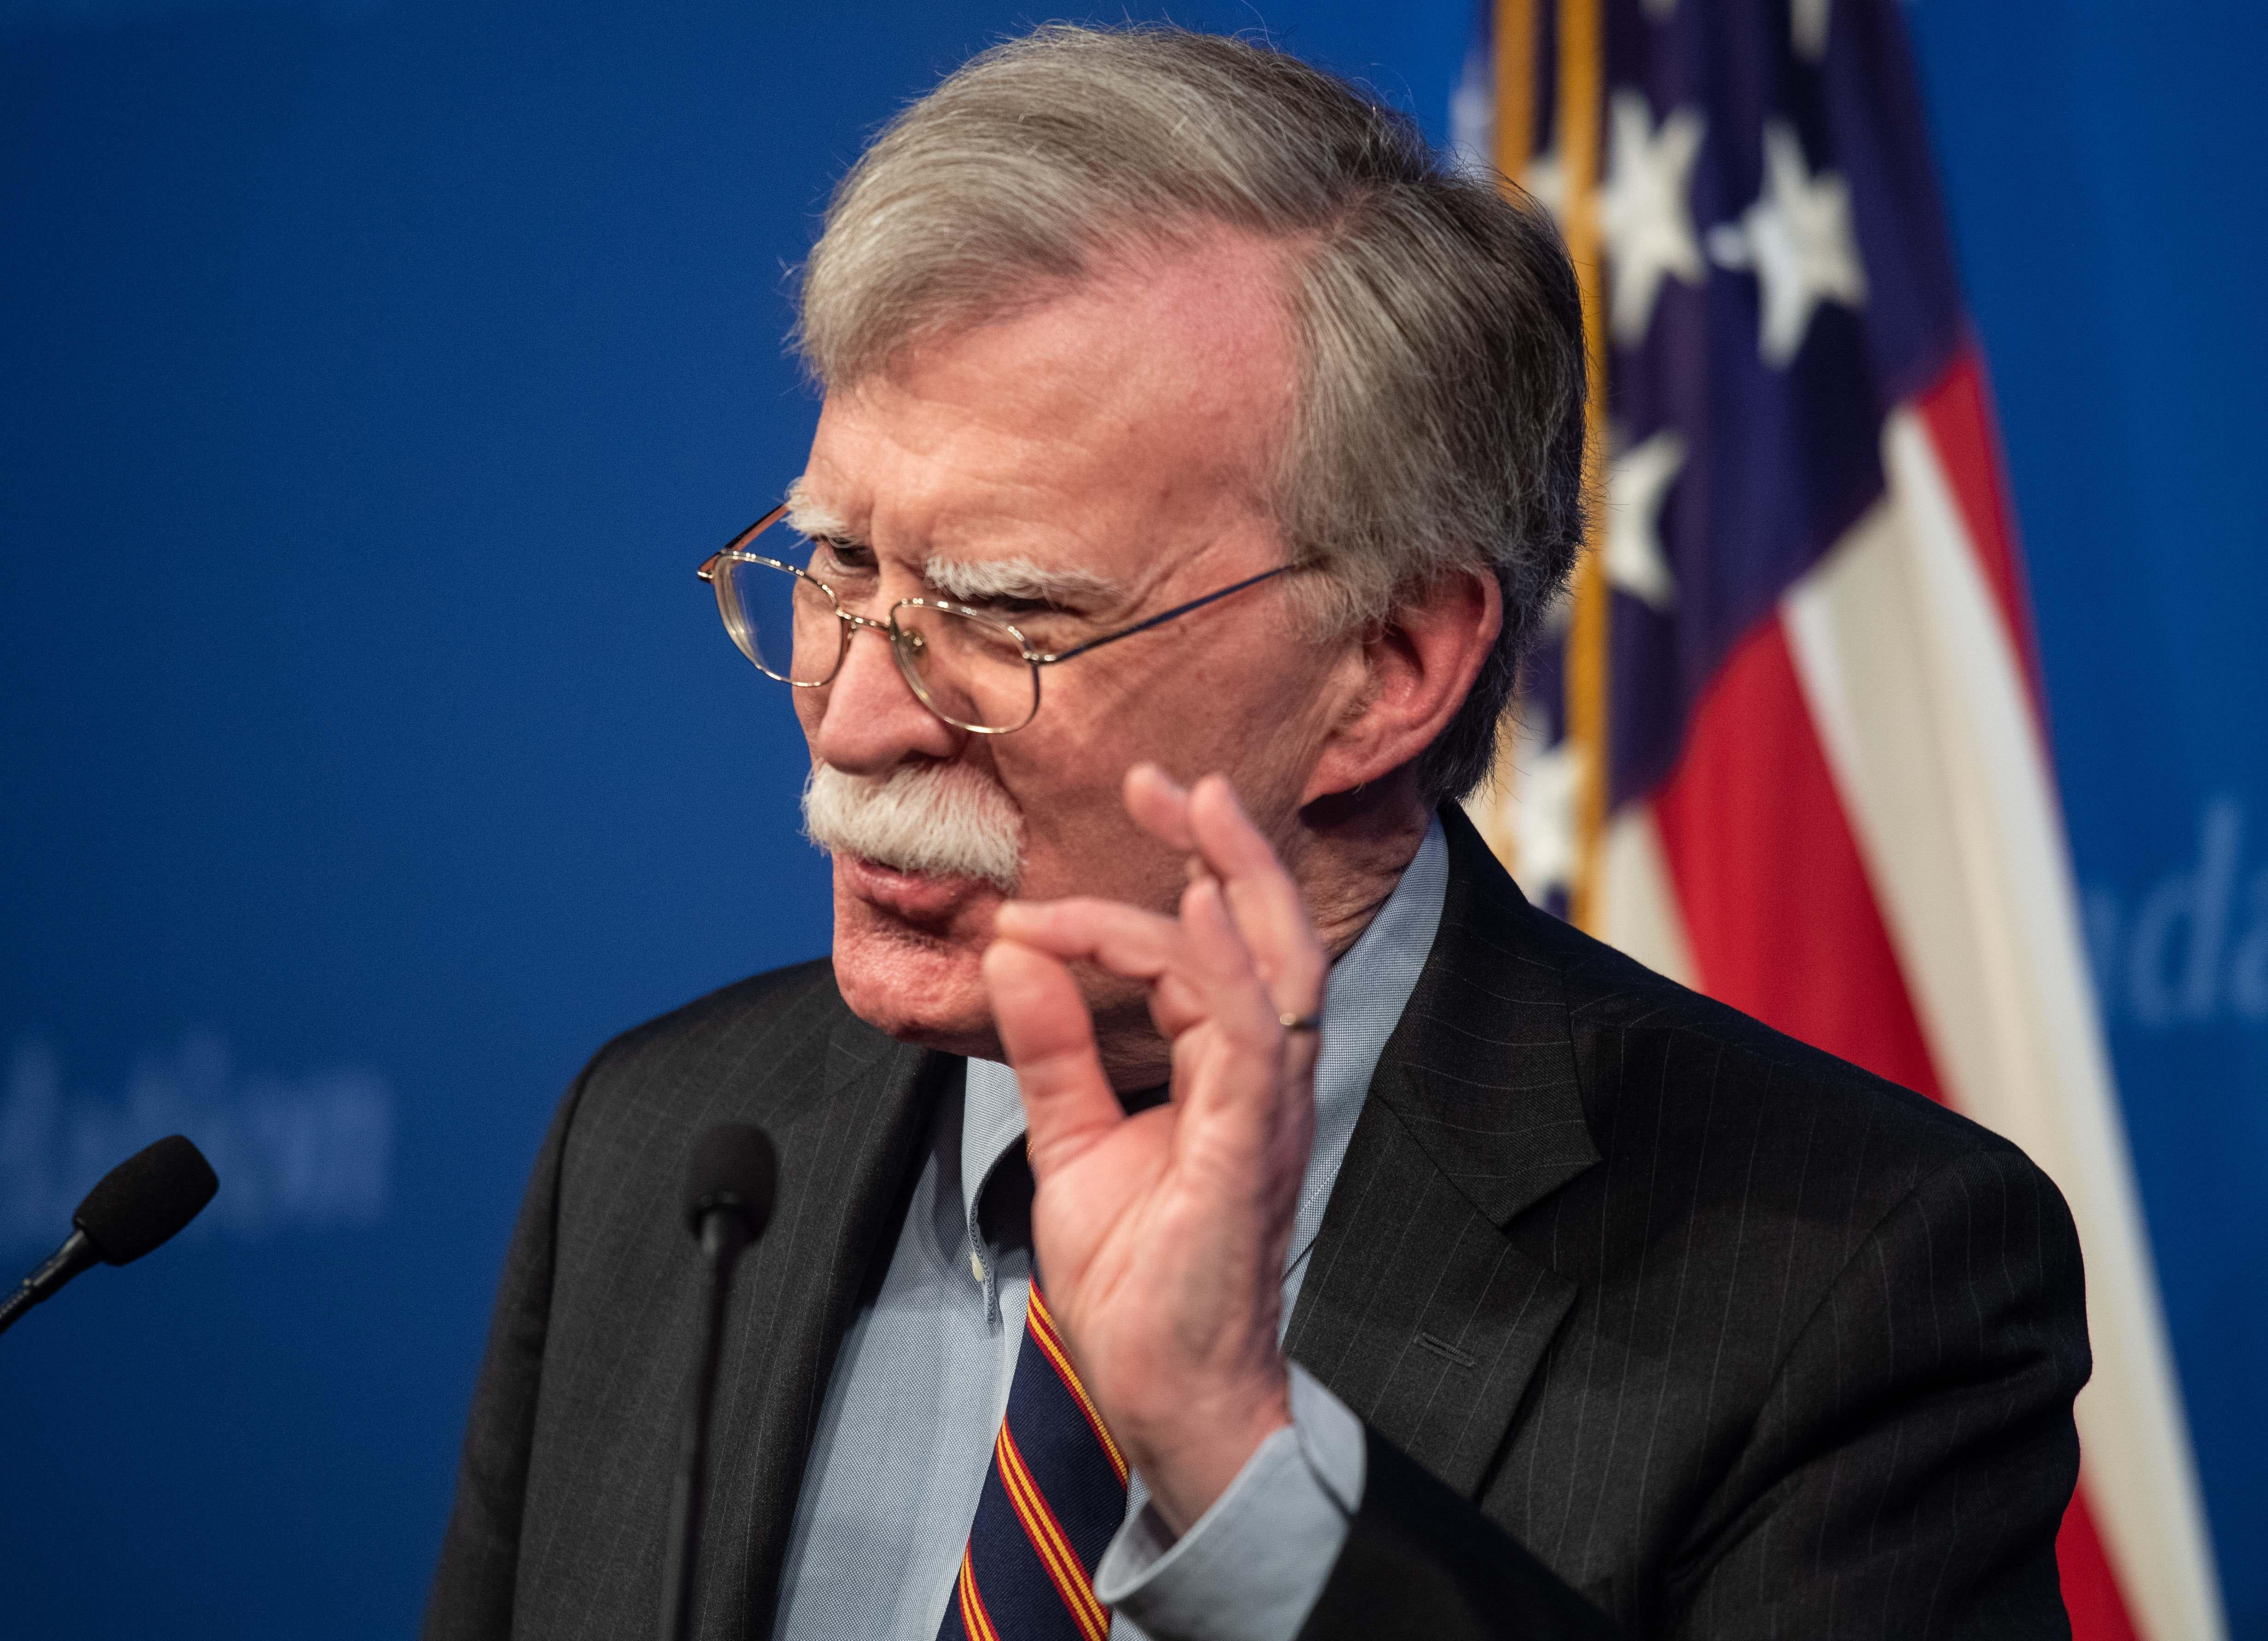 National Security Advisor John Bolton speaks at the Heritage Foundation in Washington, D.C. on December 13, 2018.